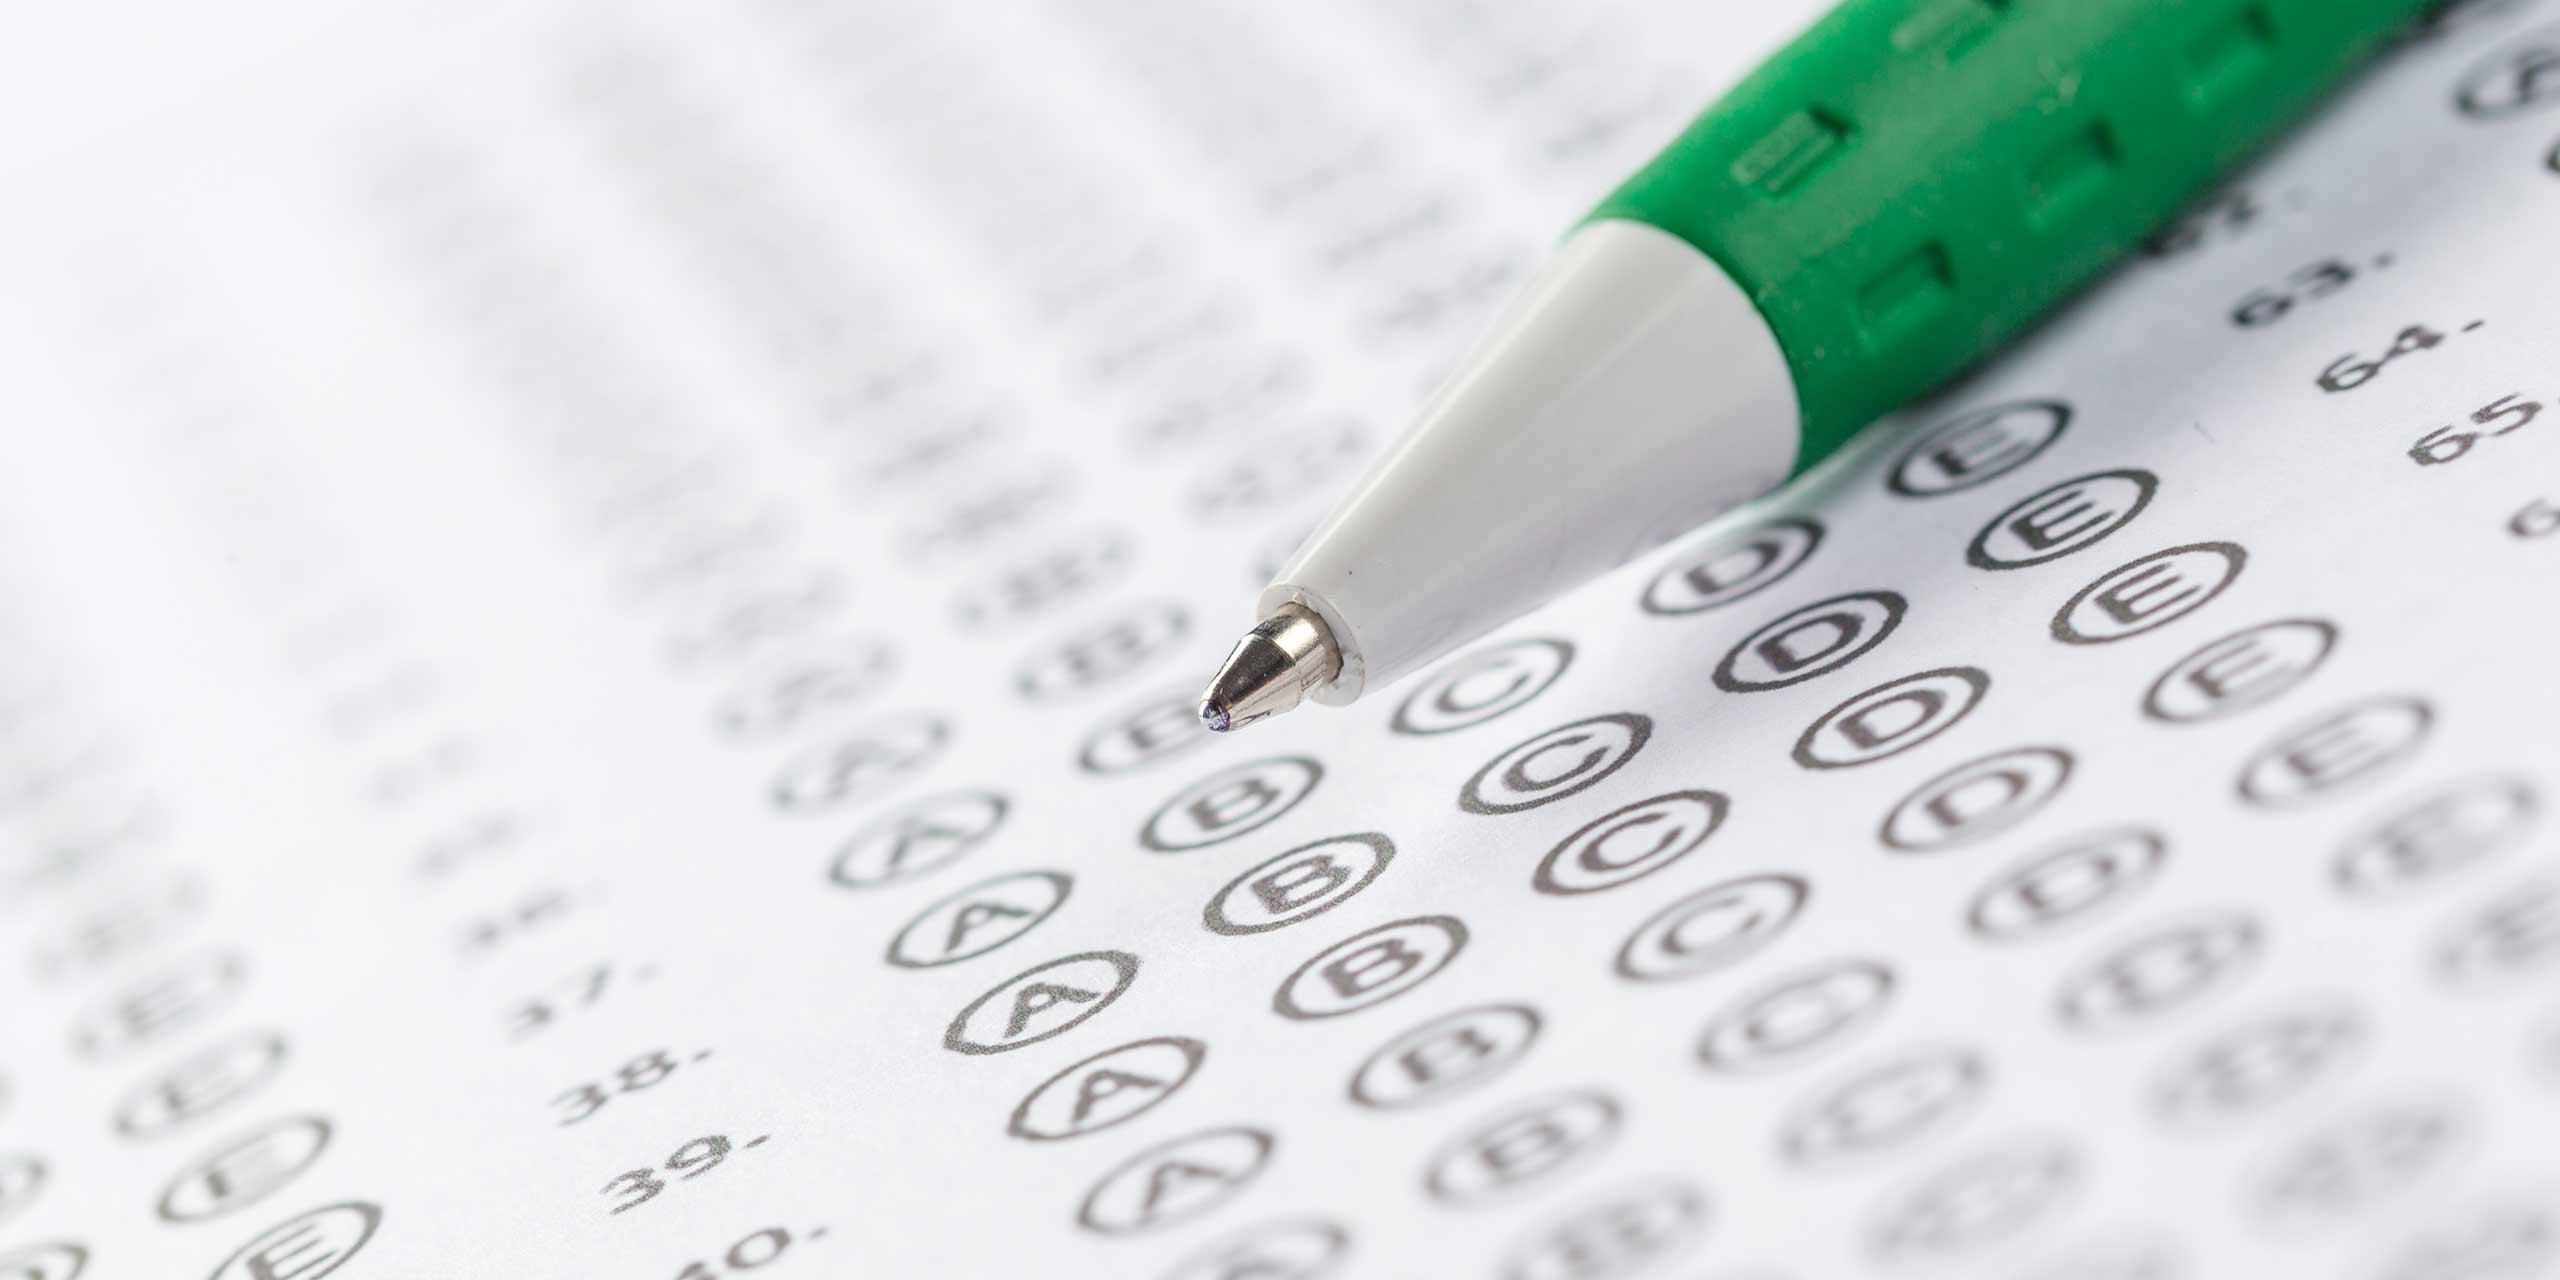 make a multiple choice test